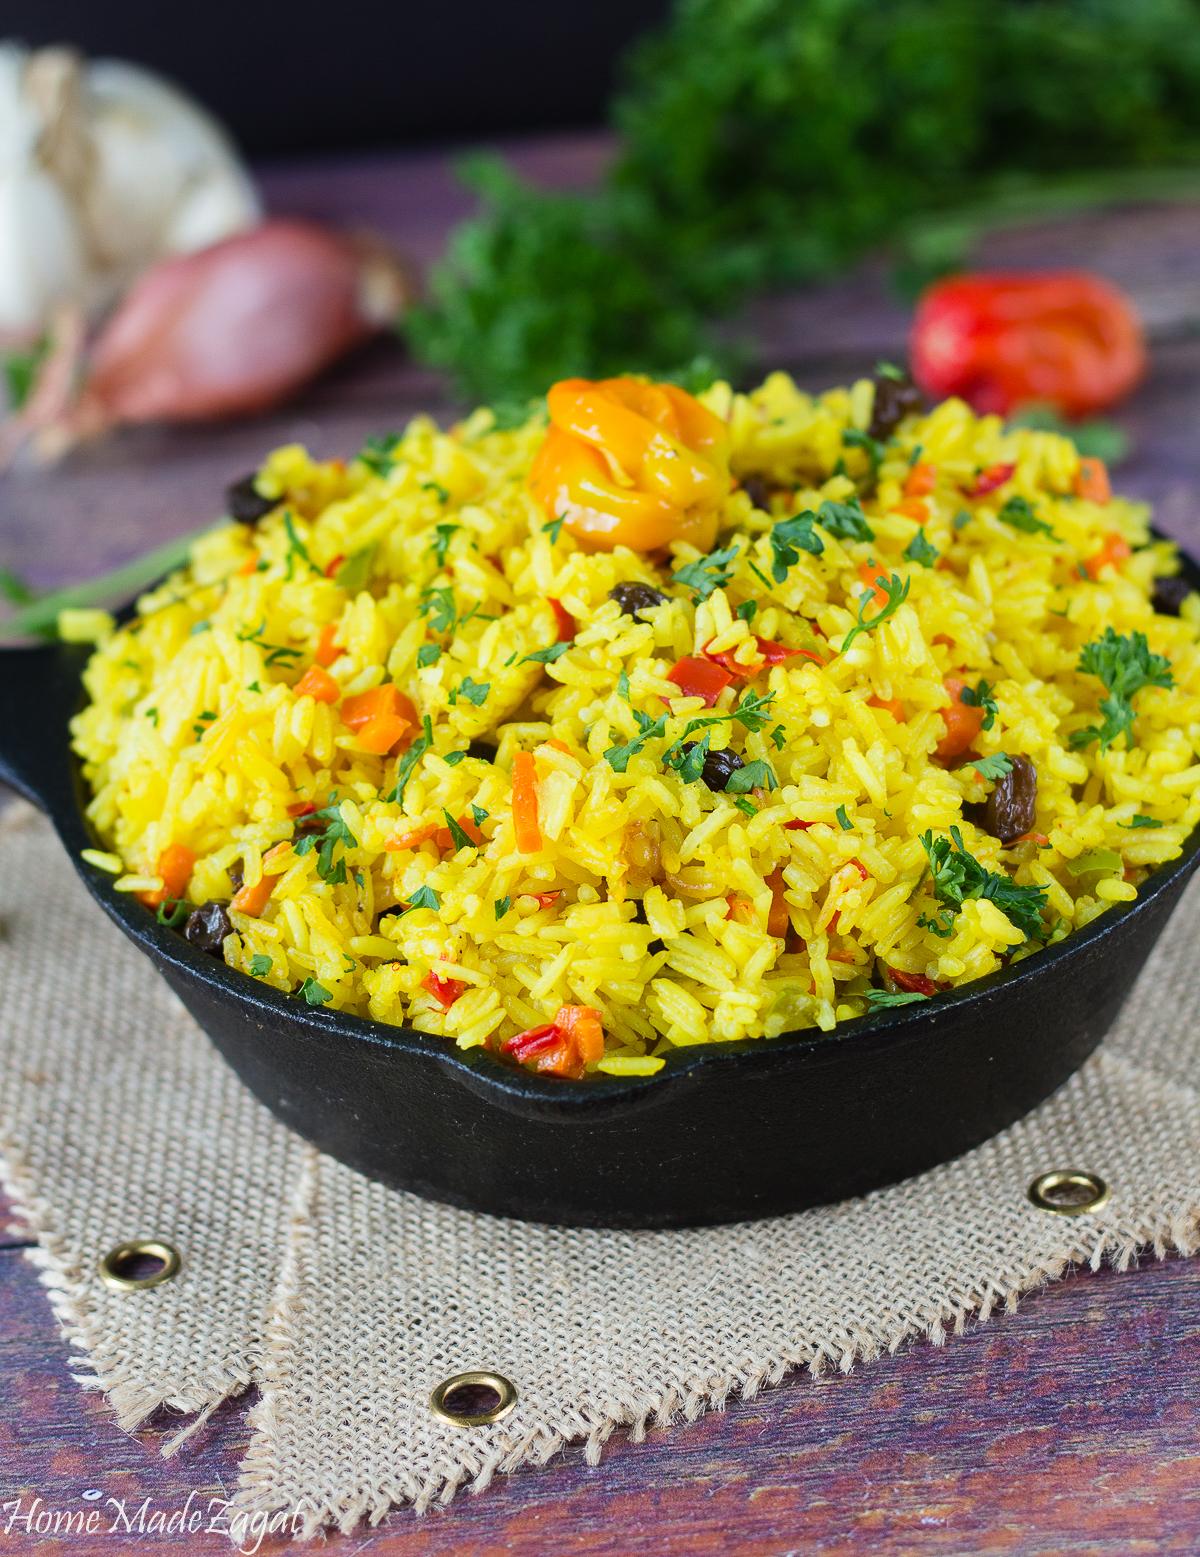 Yellow Saffron Turmeric Rice Caribbean Style